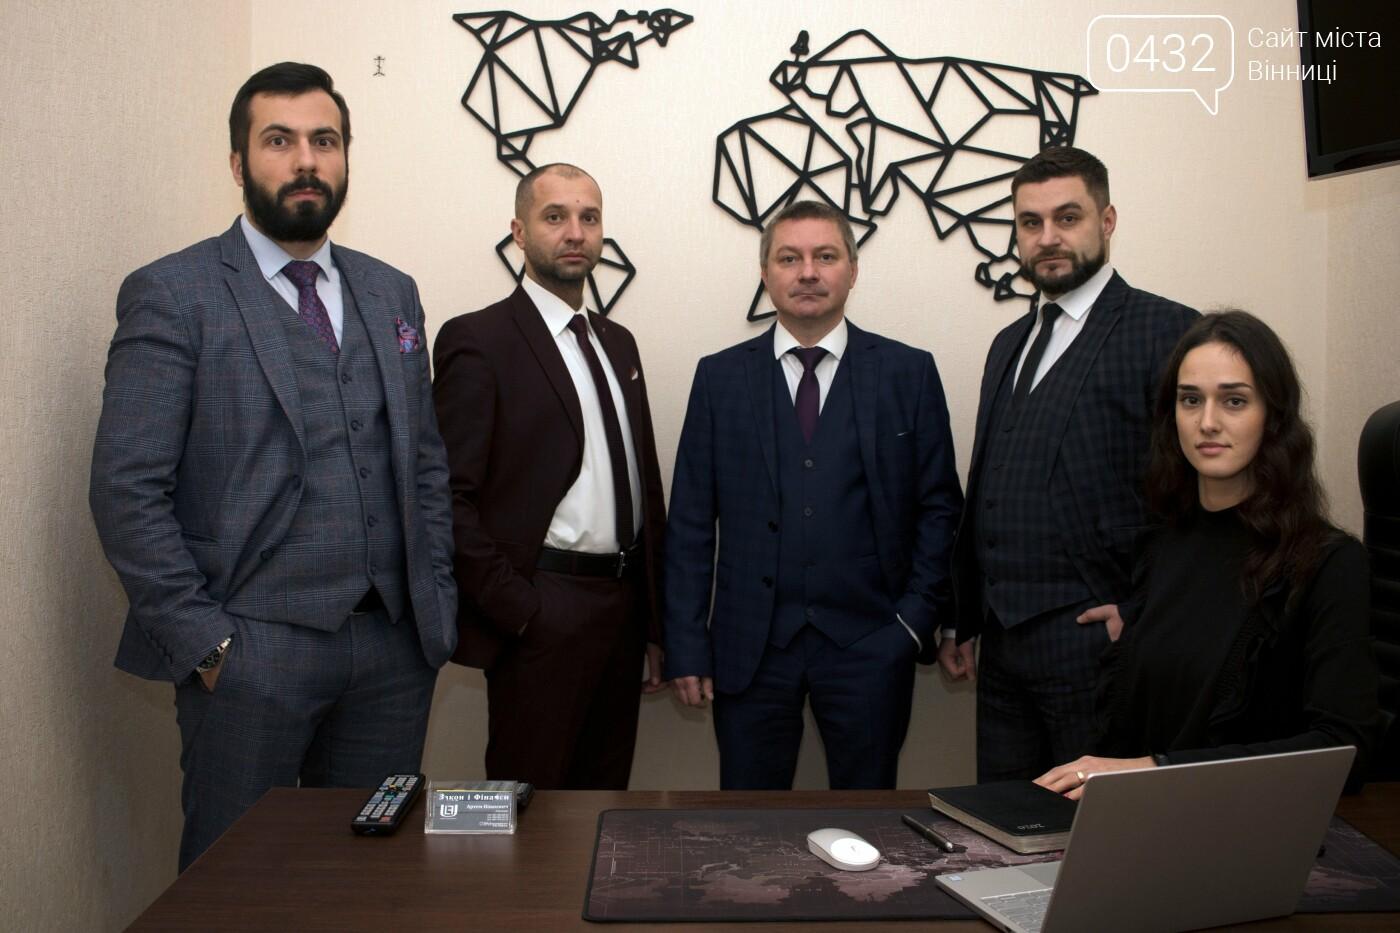 Как адвокаты избавили клиента от долгов: адвокат по кредитам Винница, фото-1